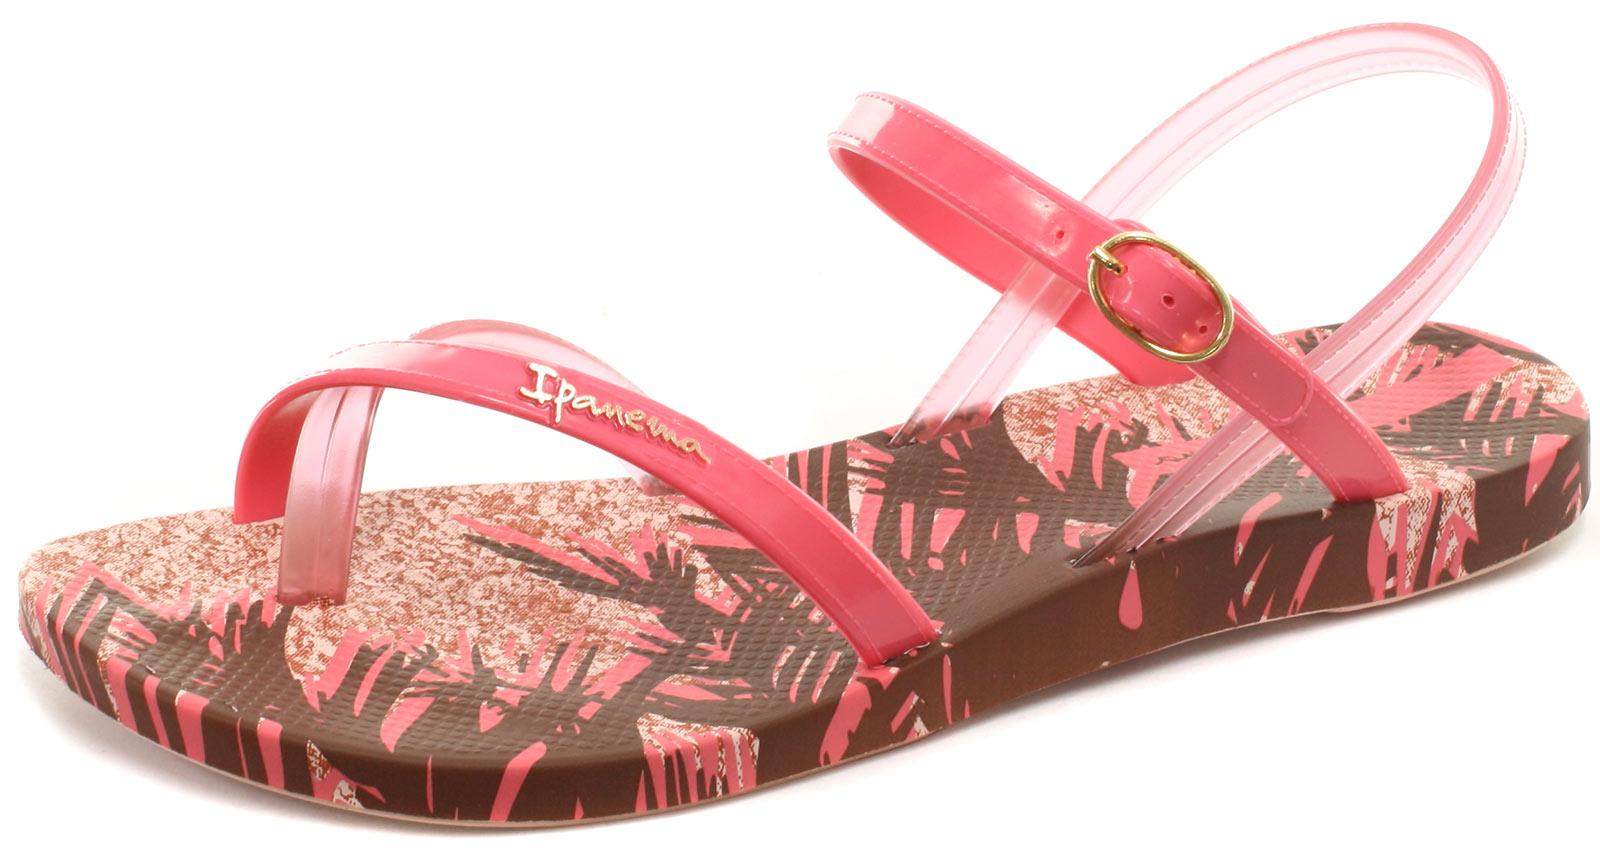 Neuf-Ipanema-Brasil-Diamond-V-Femme-Strand-Sandales